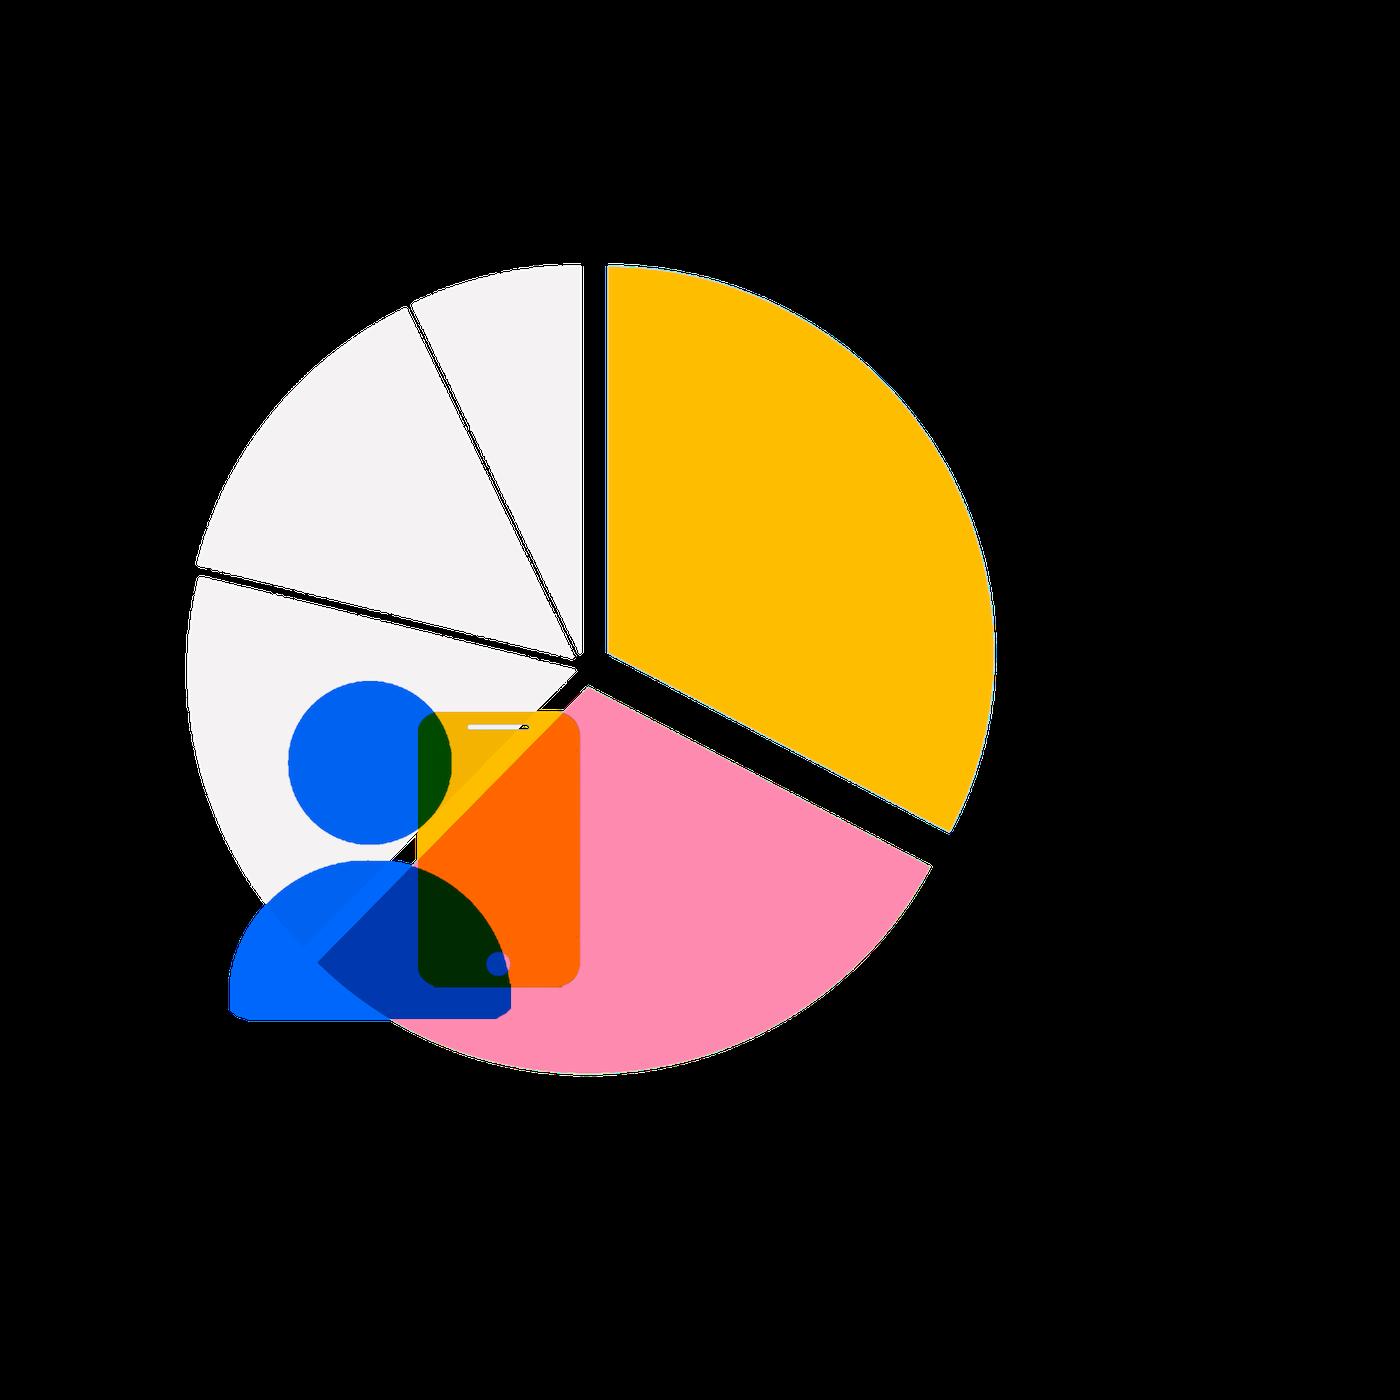 TikTok user age diagram